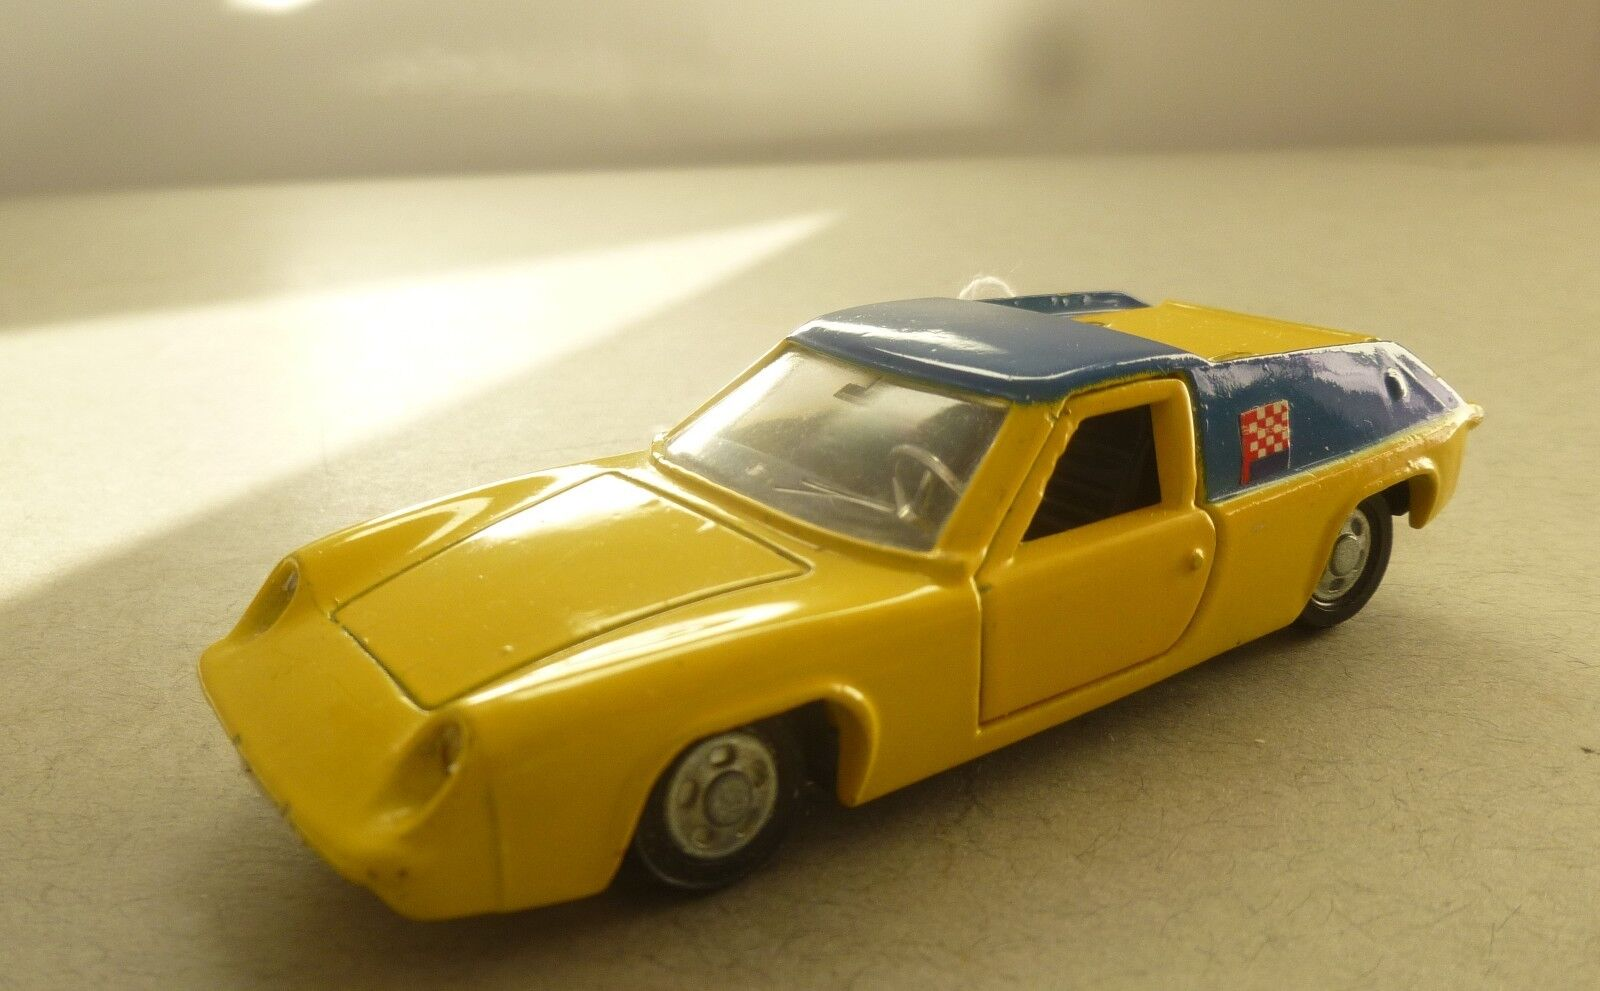 prydlig leksaker Lotus Europa Sports tävlings bil på 70 -talet prydlig leksak tävlings bils